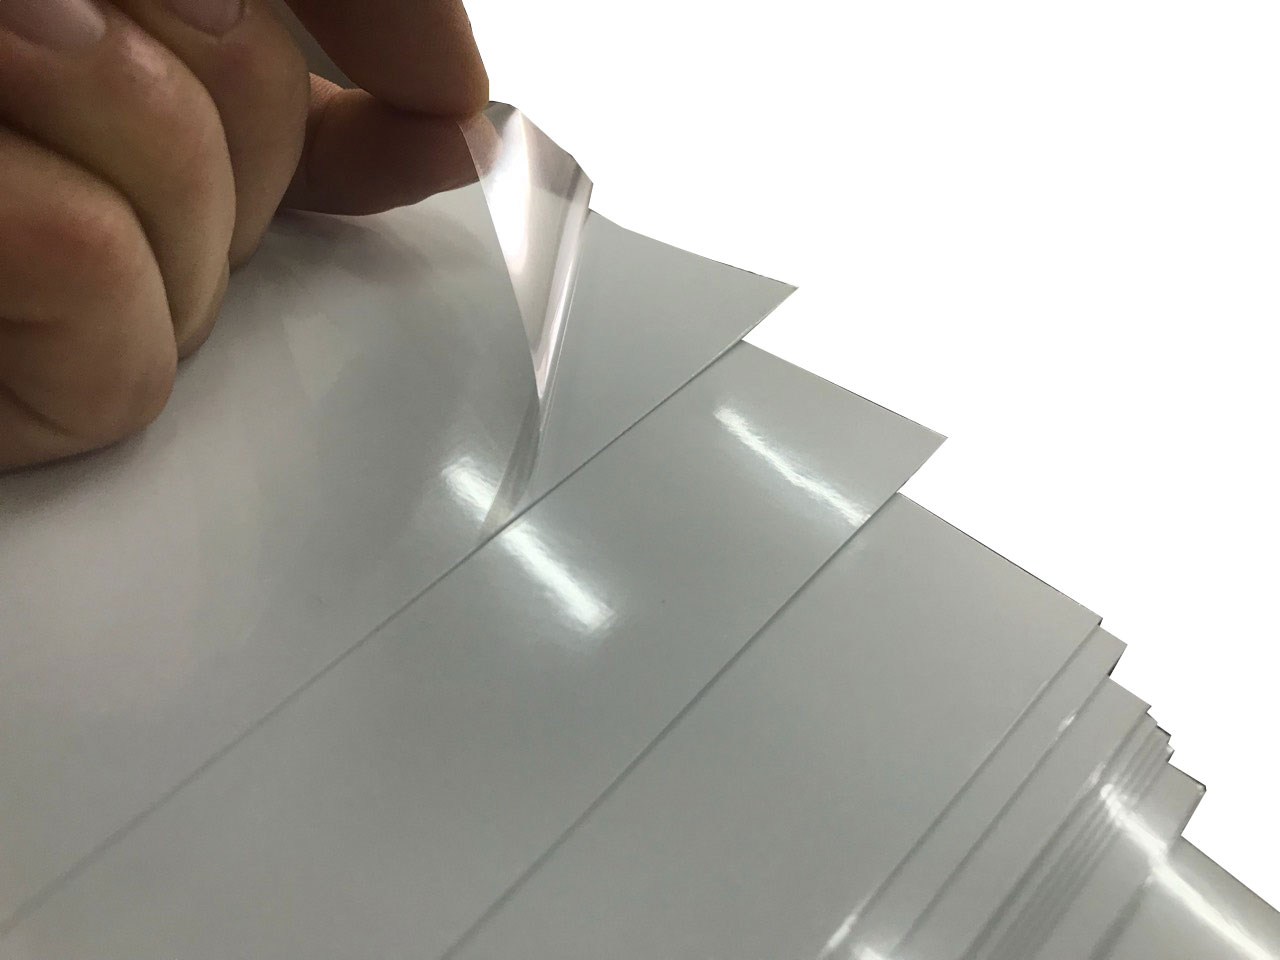 пластик самоклейка для фотокниг кольца